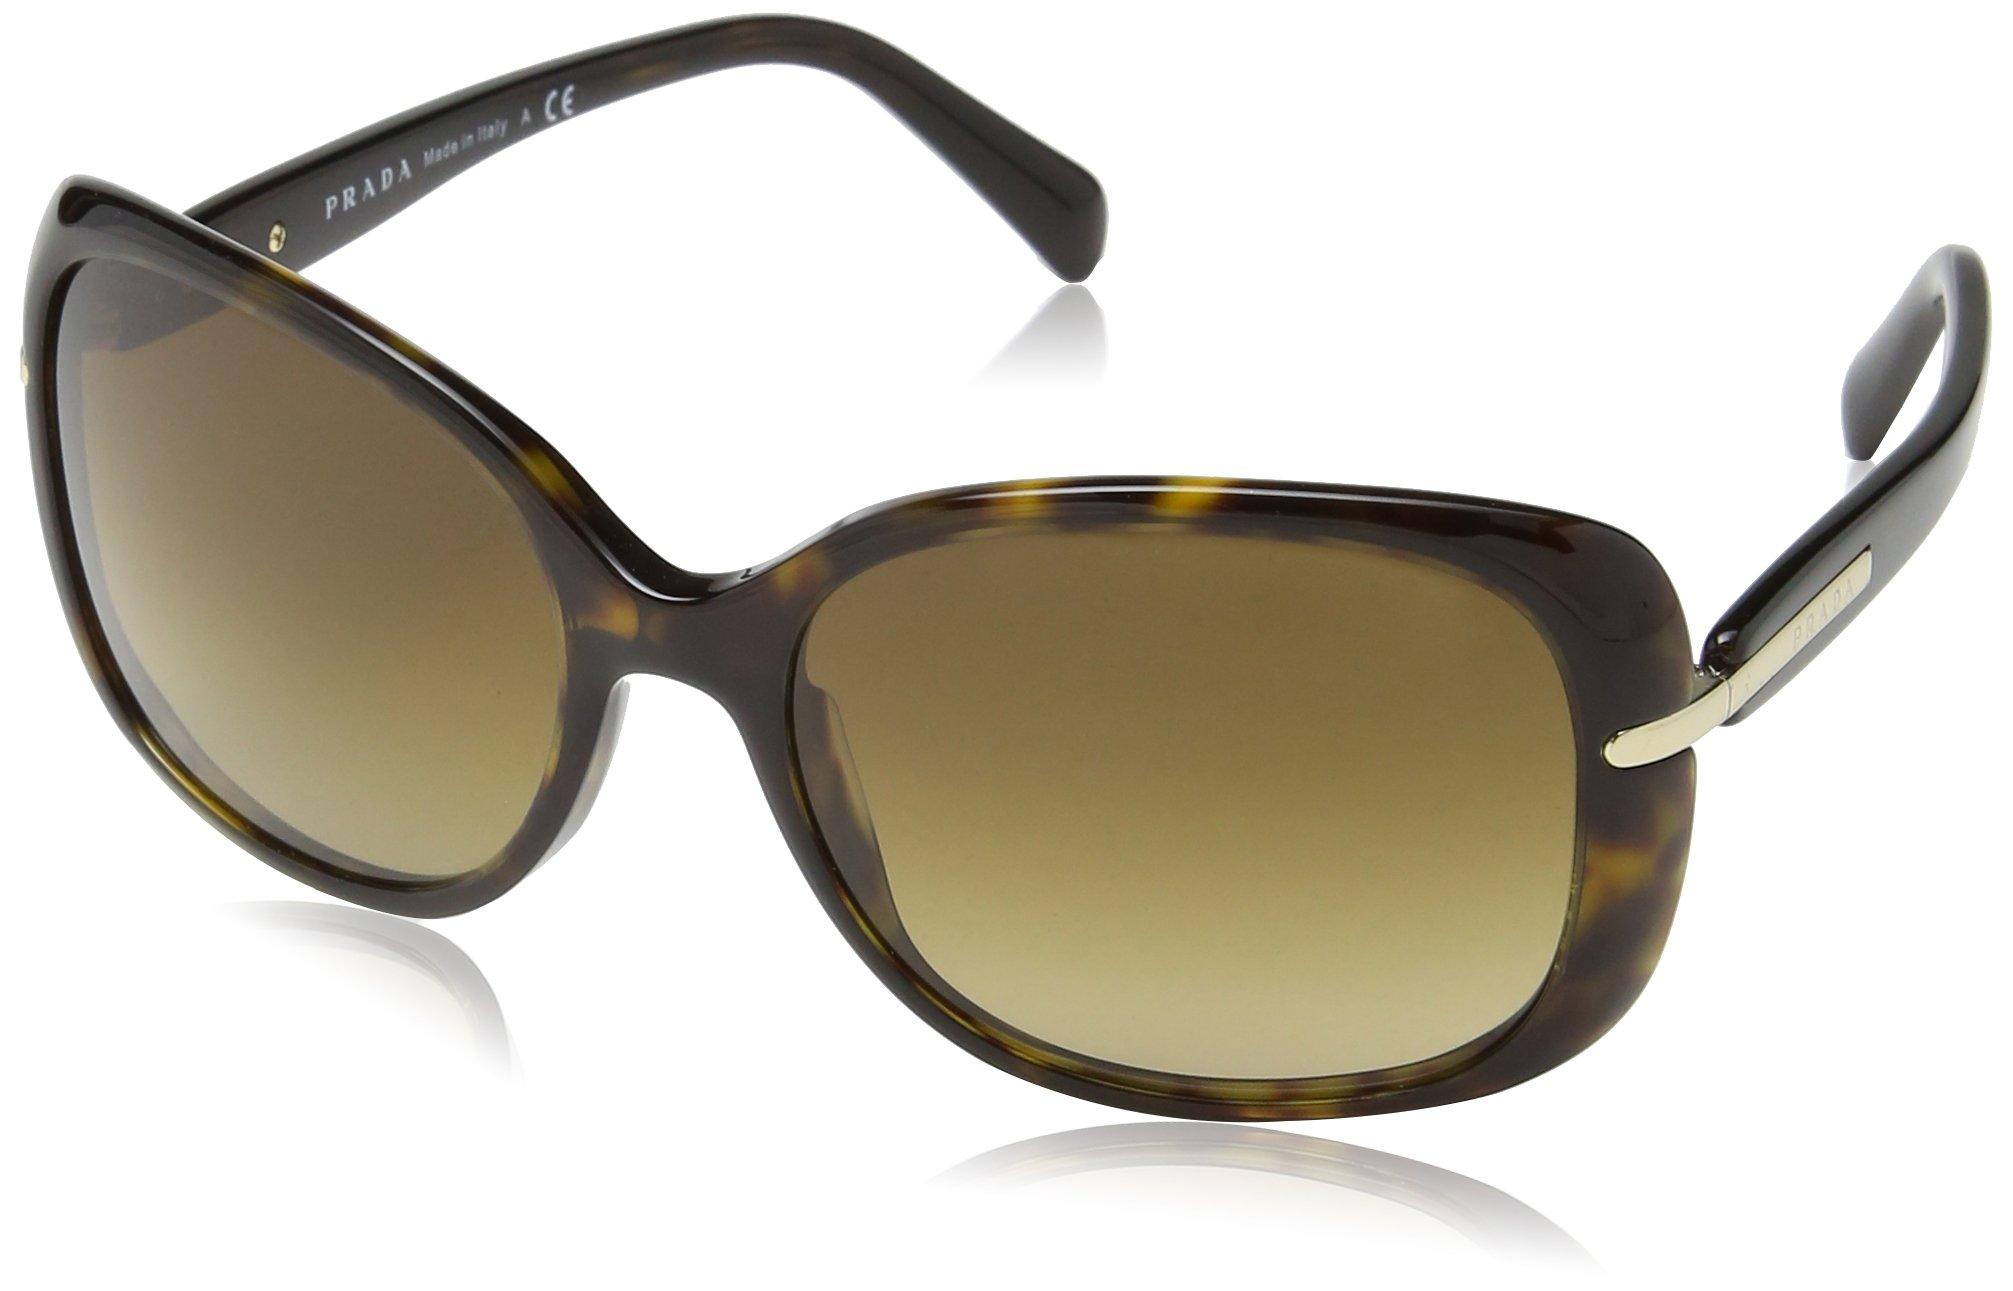 Prada SPR 08O 2AU-6S1 Havana Sunglasses SPR08O - 57mm by Prada